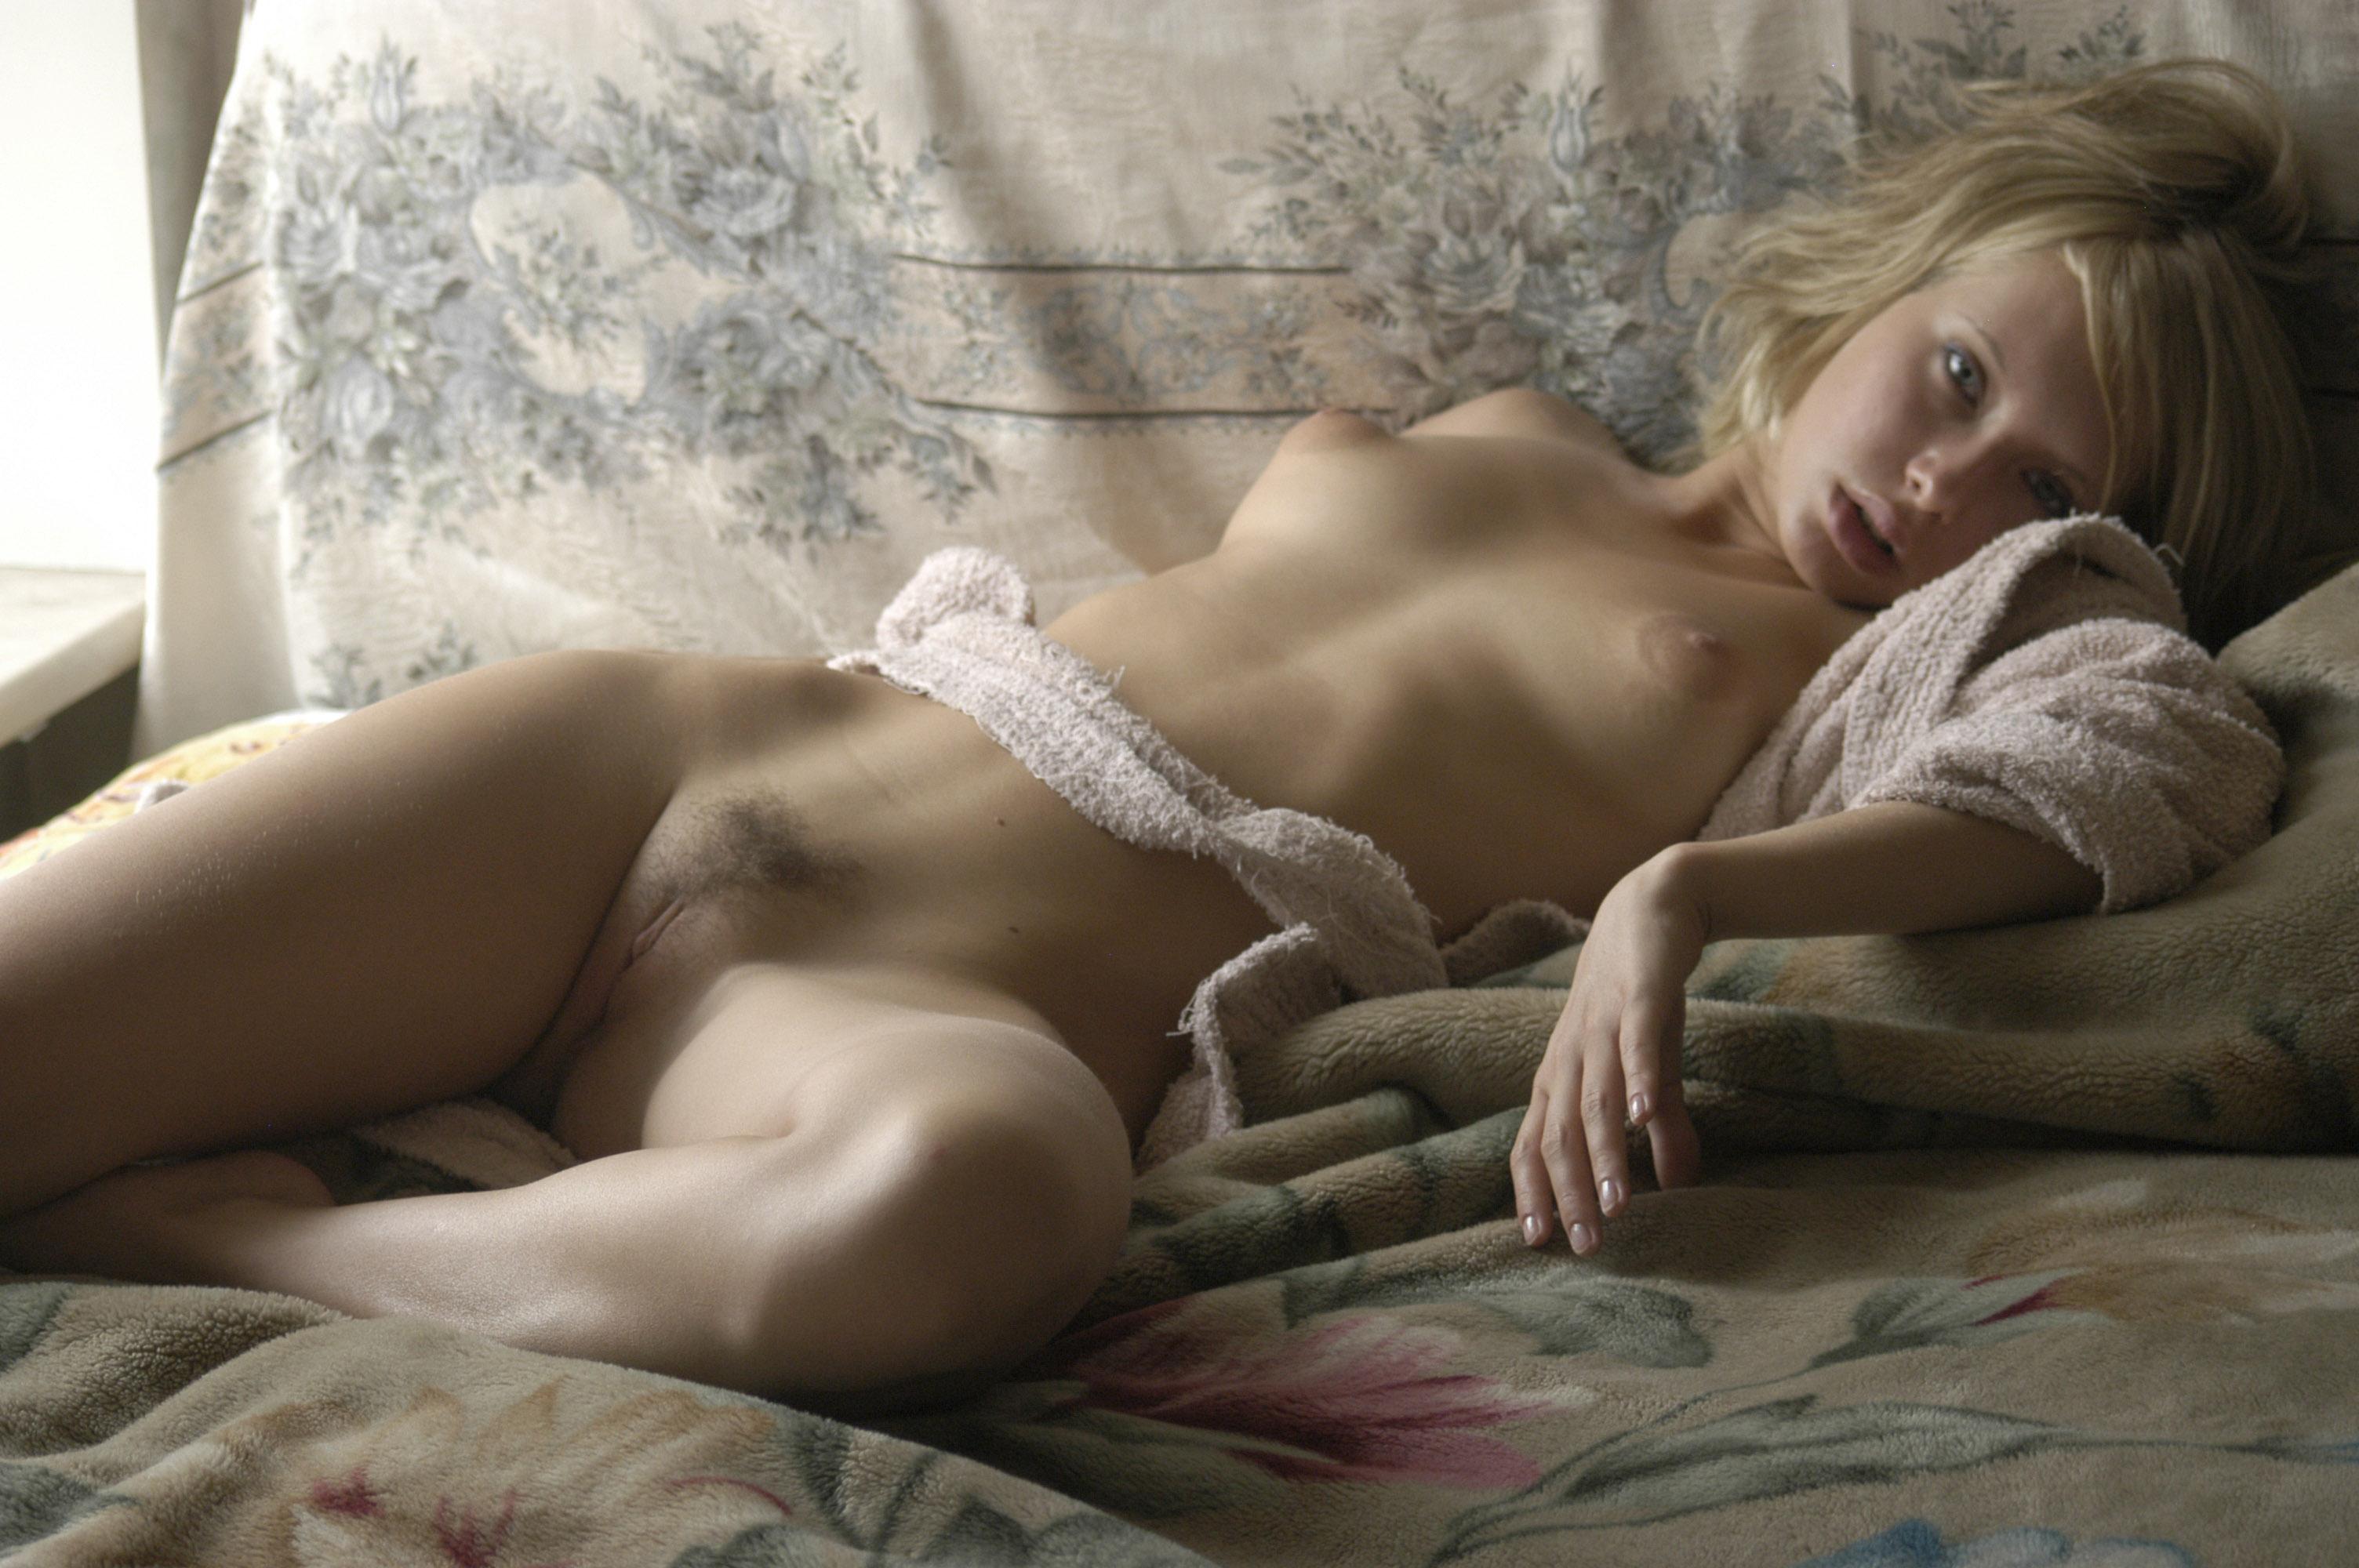 sperm hospital giant natural boobs milf nurse rafaela